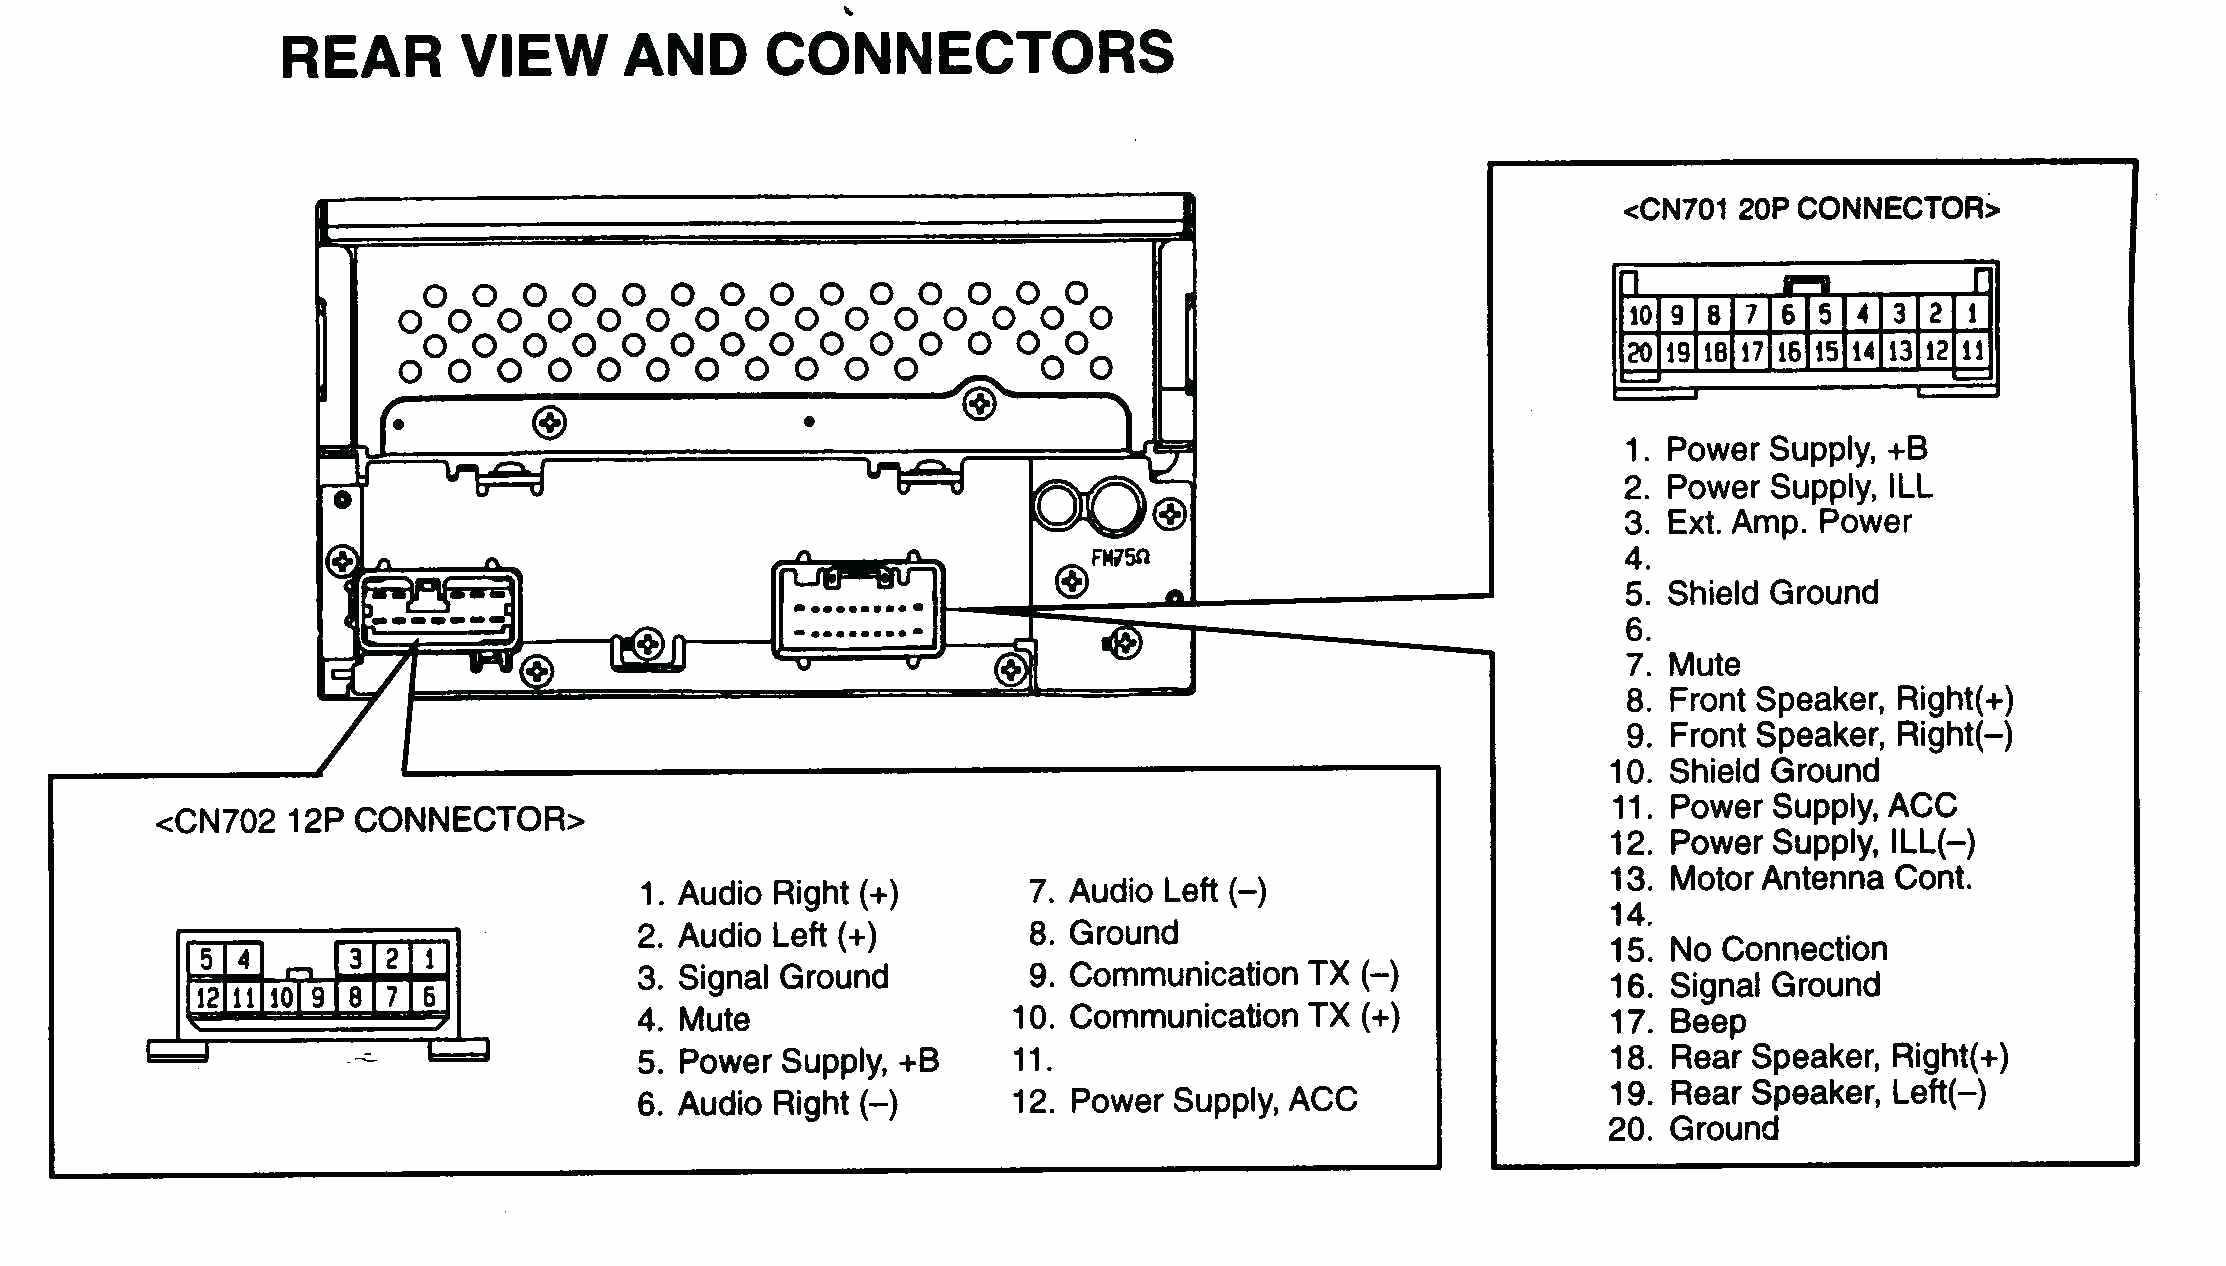 Subaru 2 5 Engine Diagram Wiring Diagram for Nest thermostat Page 3 Legacy Radio Harness 1996 Of Subaru 2 5 Engine Diagram